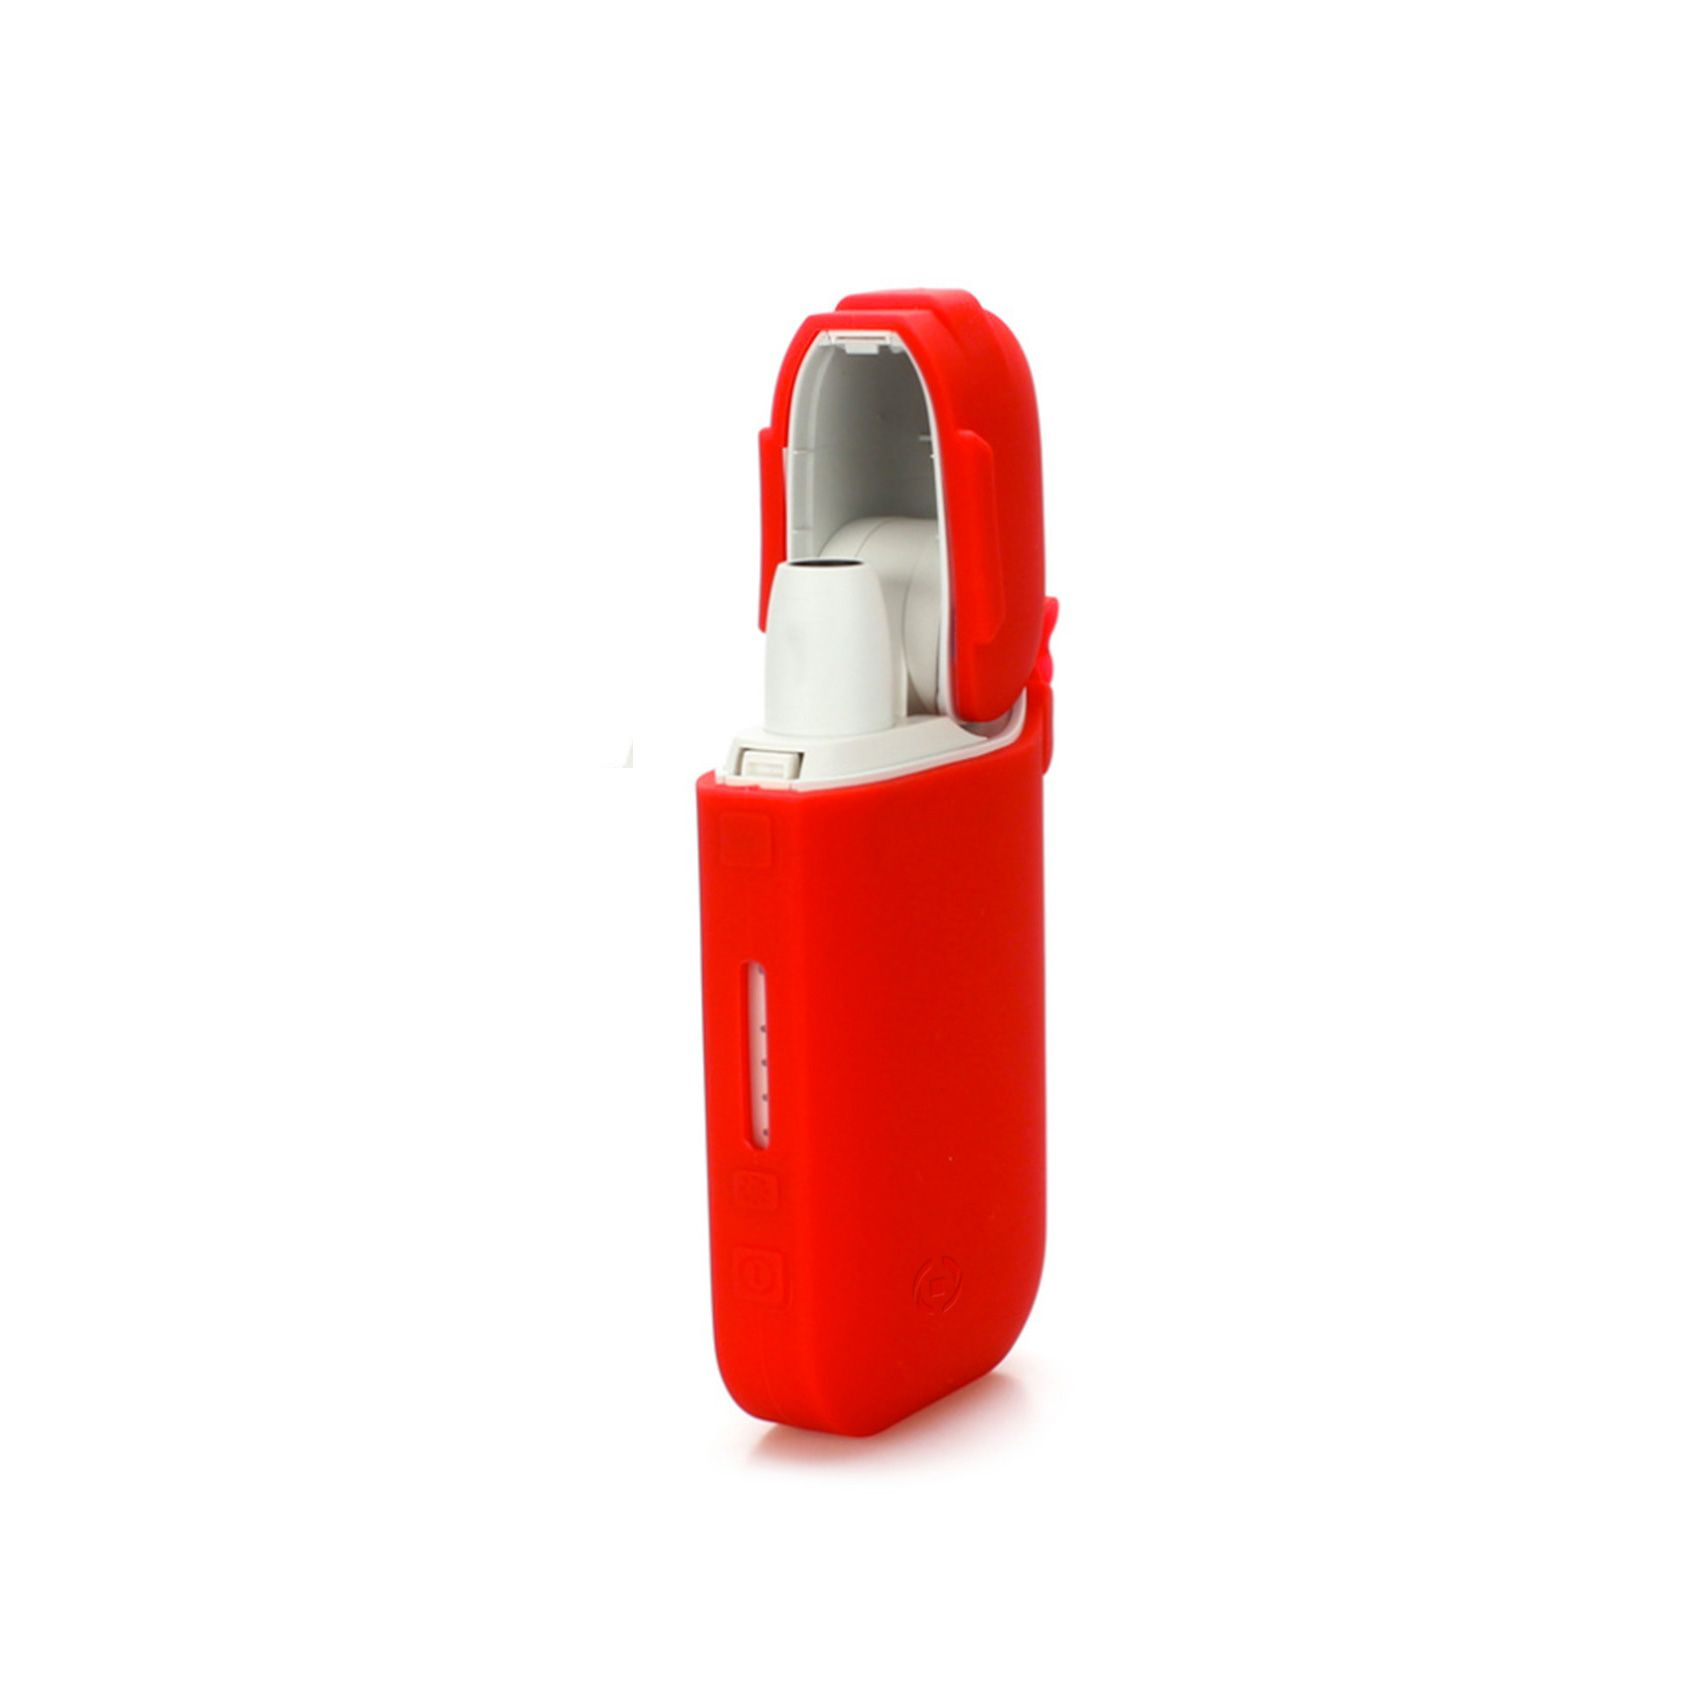 Silikonové pouzdro CELLY na elektronické cigarety IQOS, červené